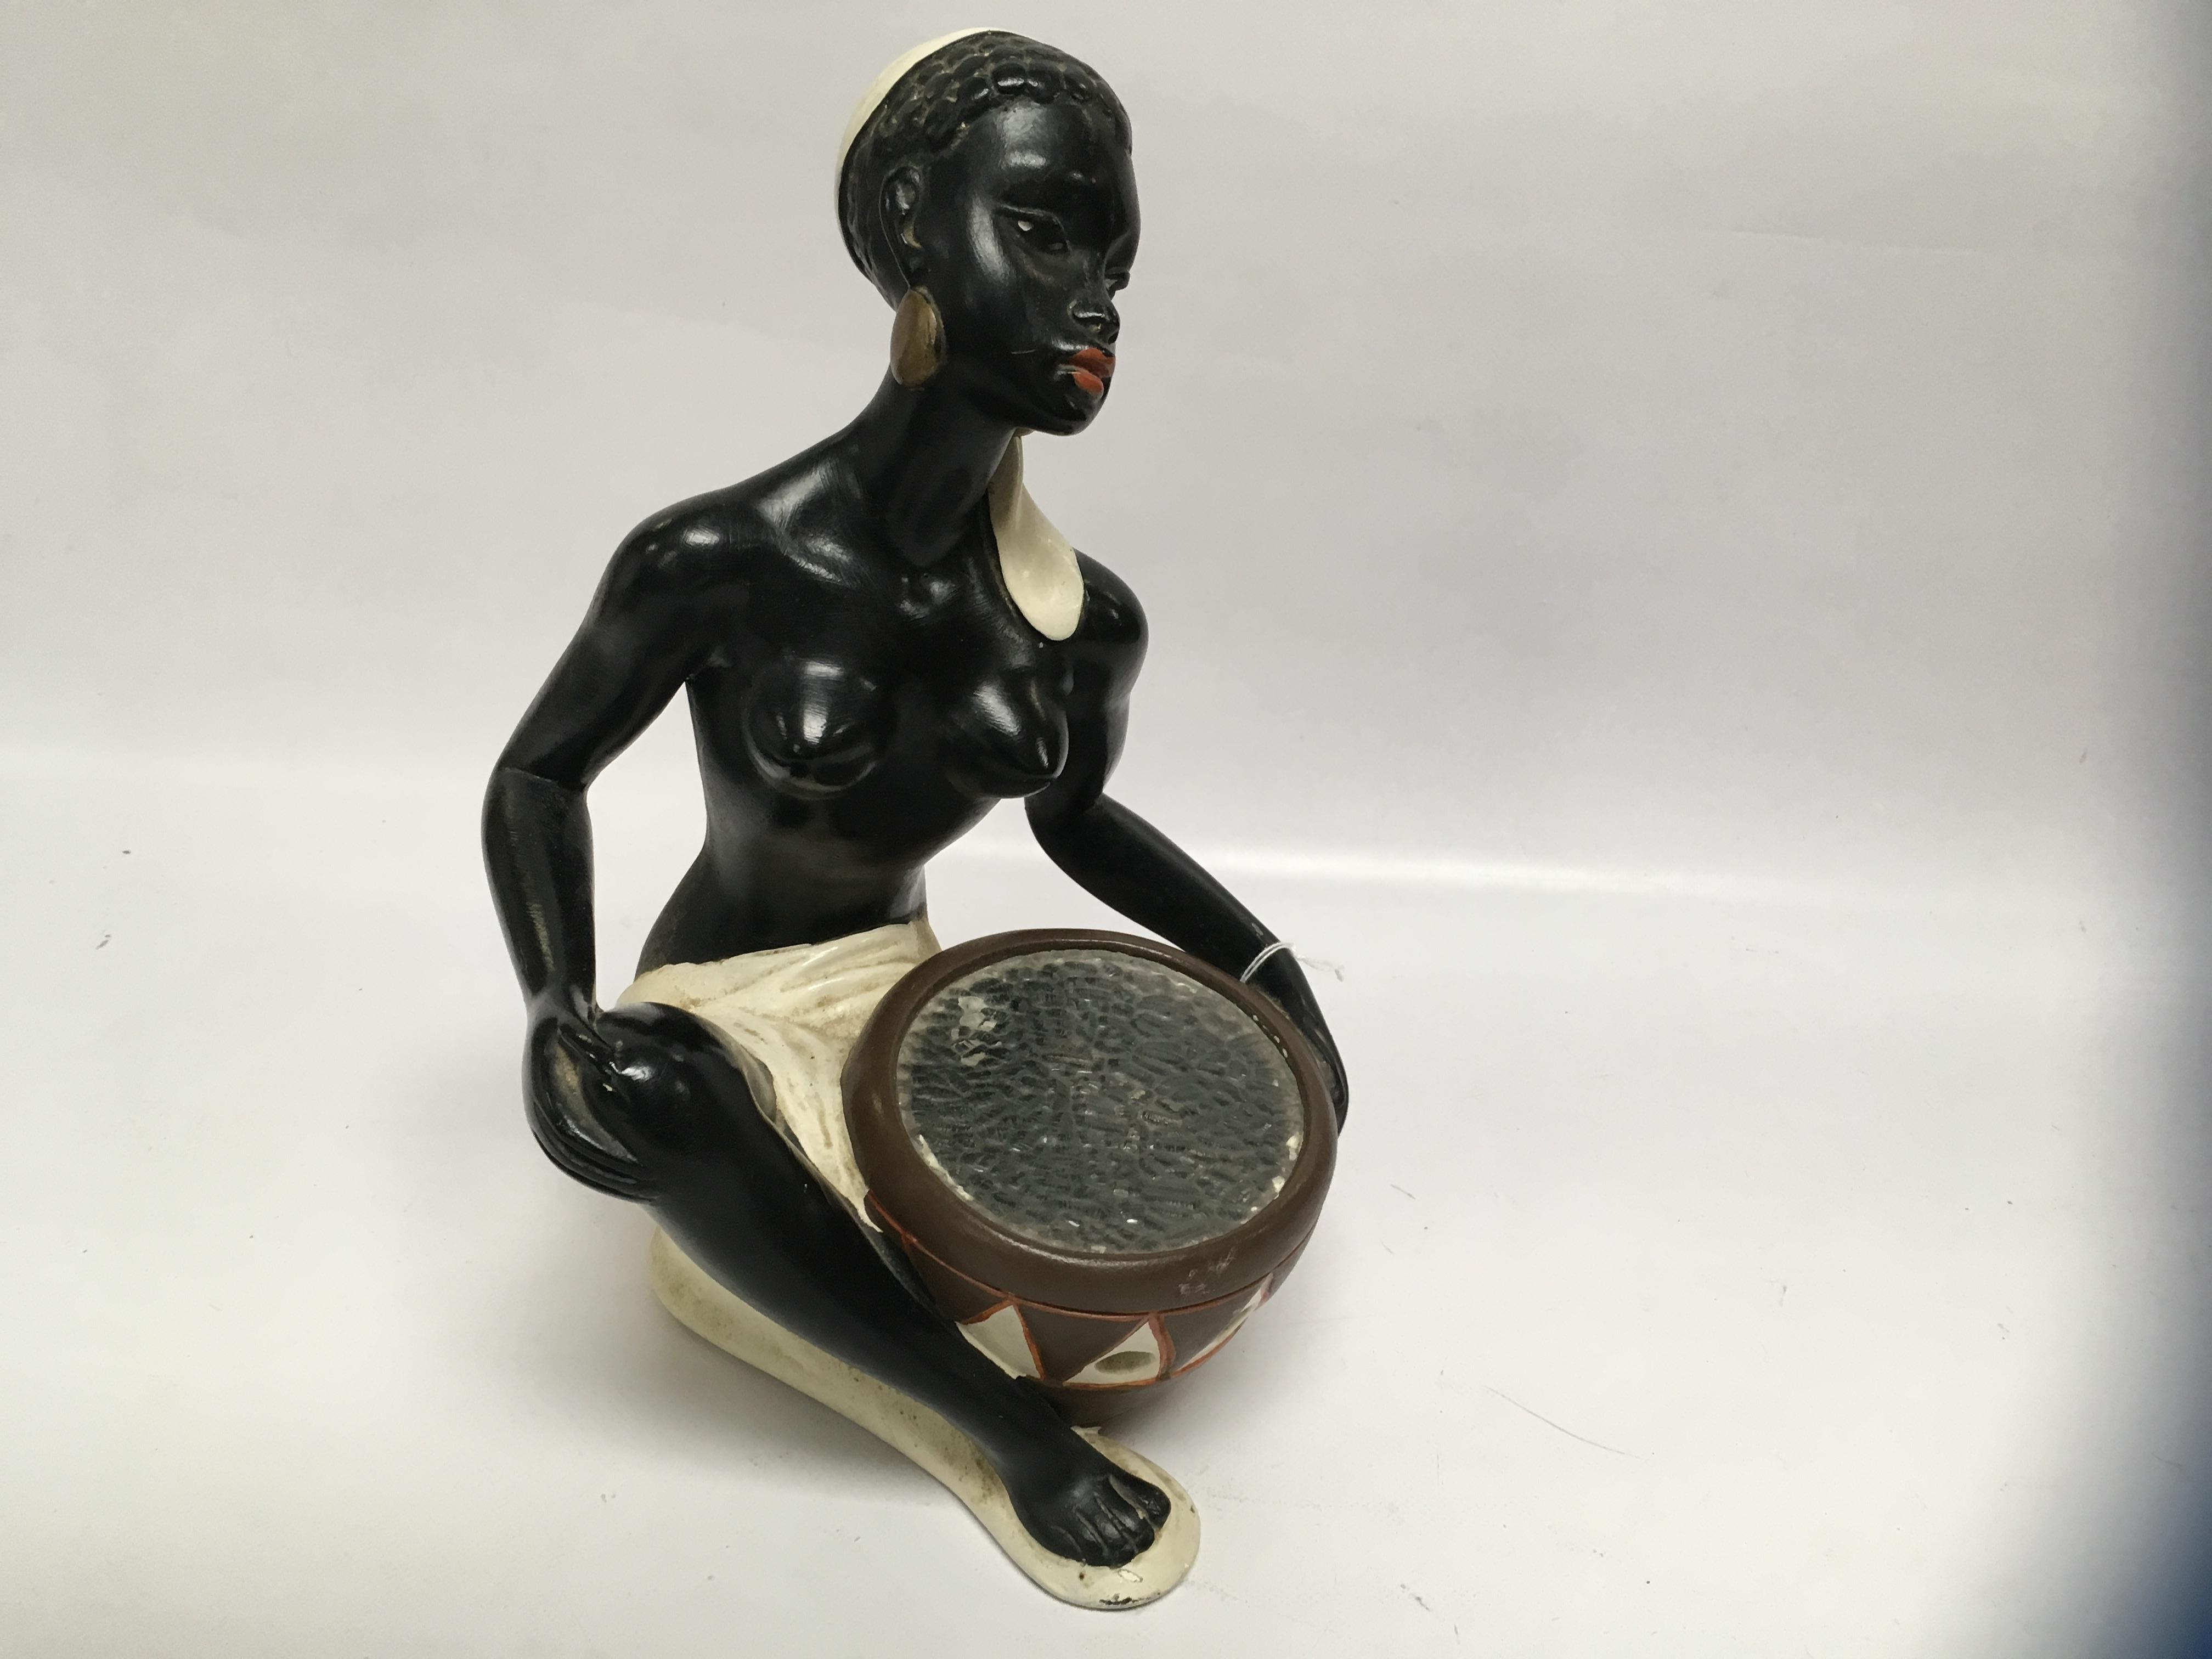 Lot 59 - VINTAGE 1950'S SEMI-NUDE CHALK AFRICAN LADY INSCRIBED INDISTINCT, ROD DENO 898698,